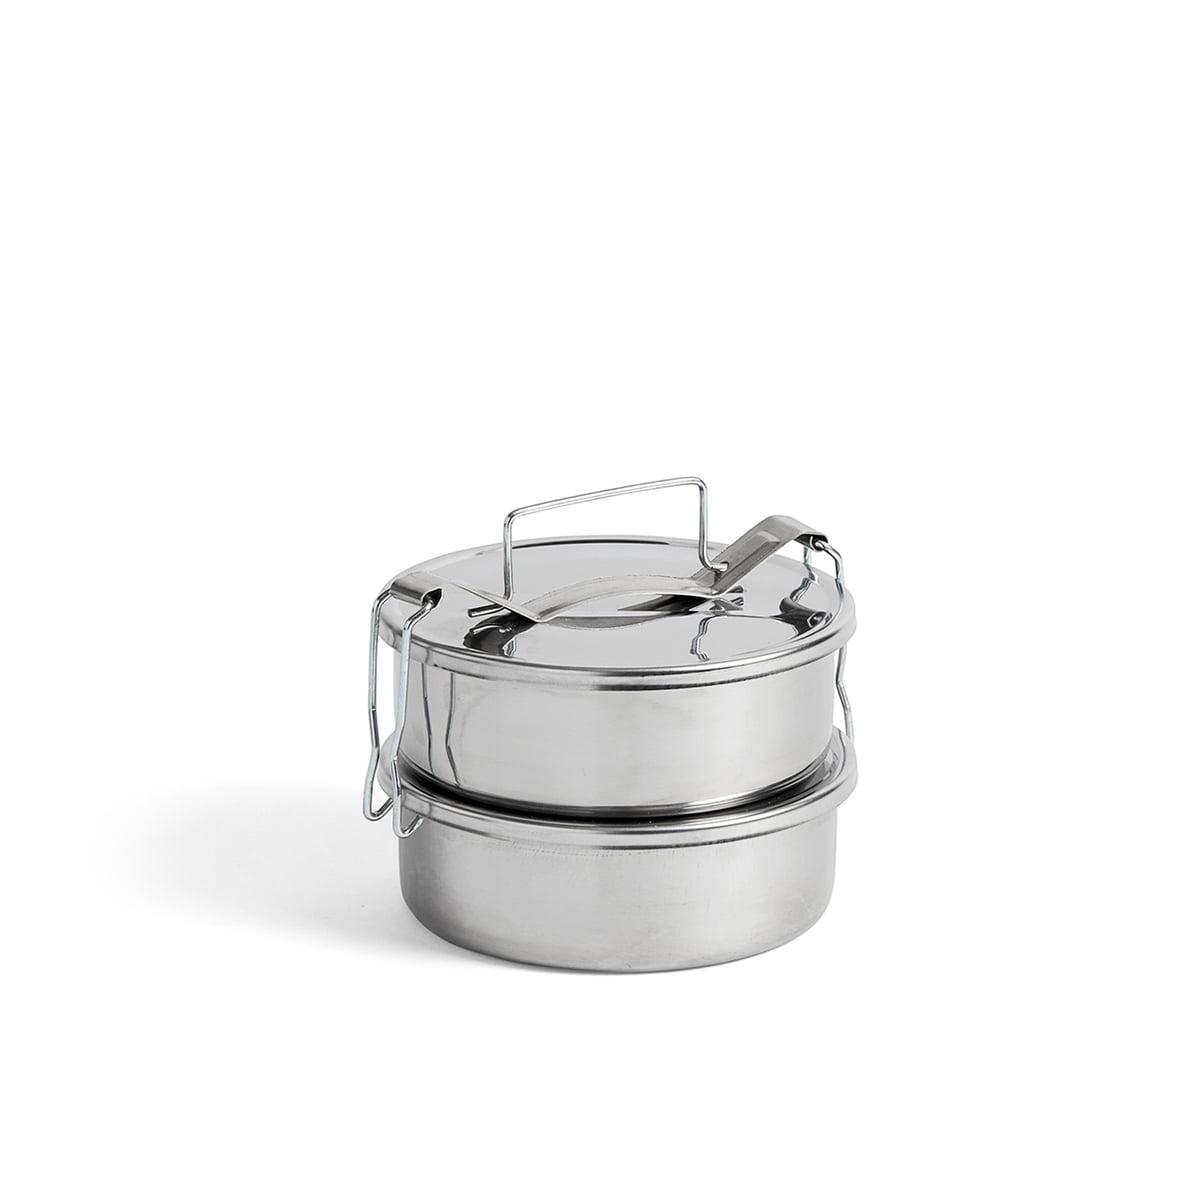 Hay - Picknick Container S, Edelstahl | Büro > Büroschränke > Container | Edelstahl | Edelstahl | Hay